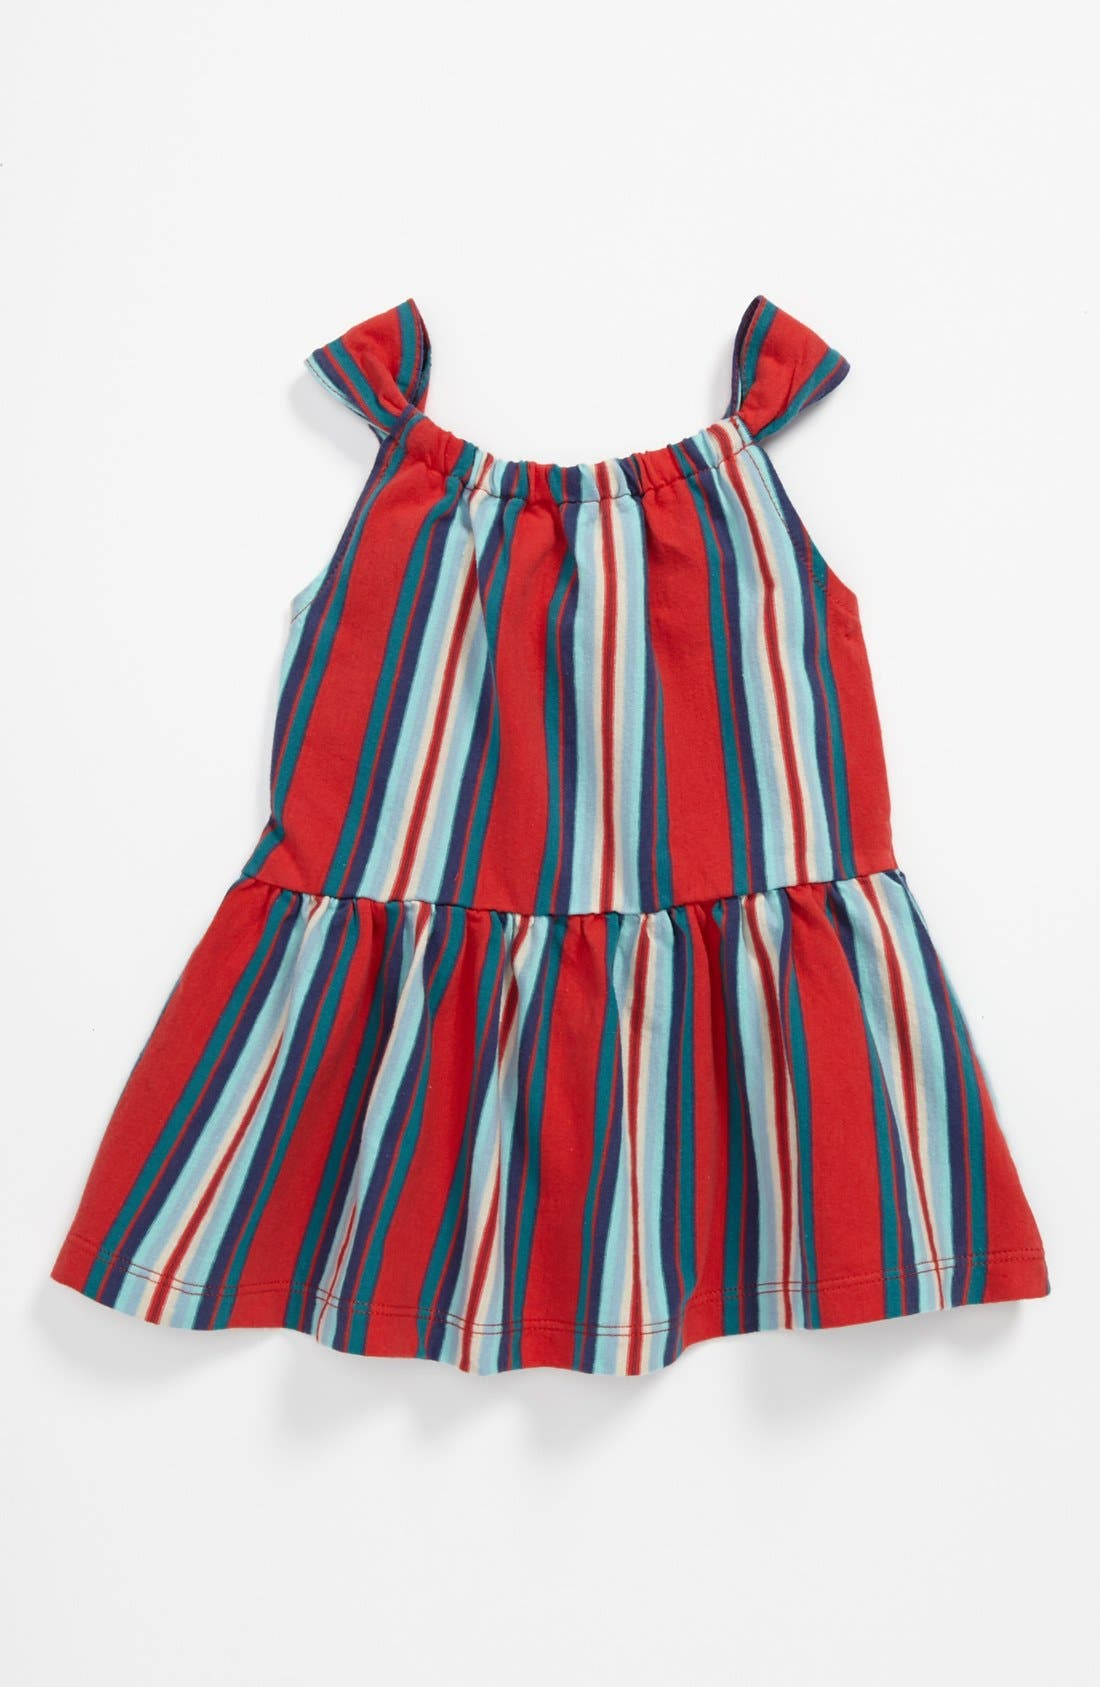 Alternate Image 1 Selected - Tea Collection 'Venda' Top (Little Girls & Big Girls)